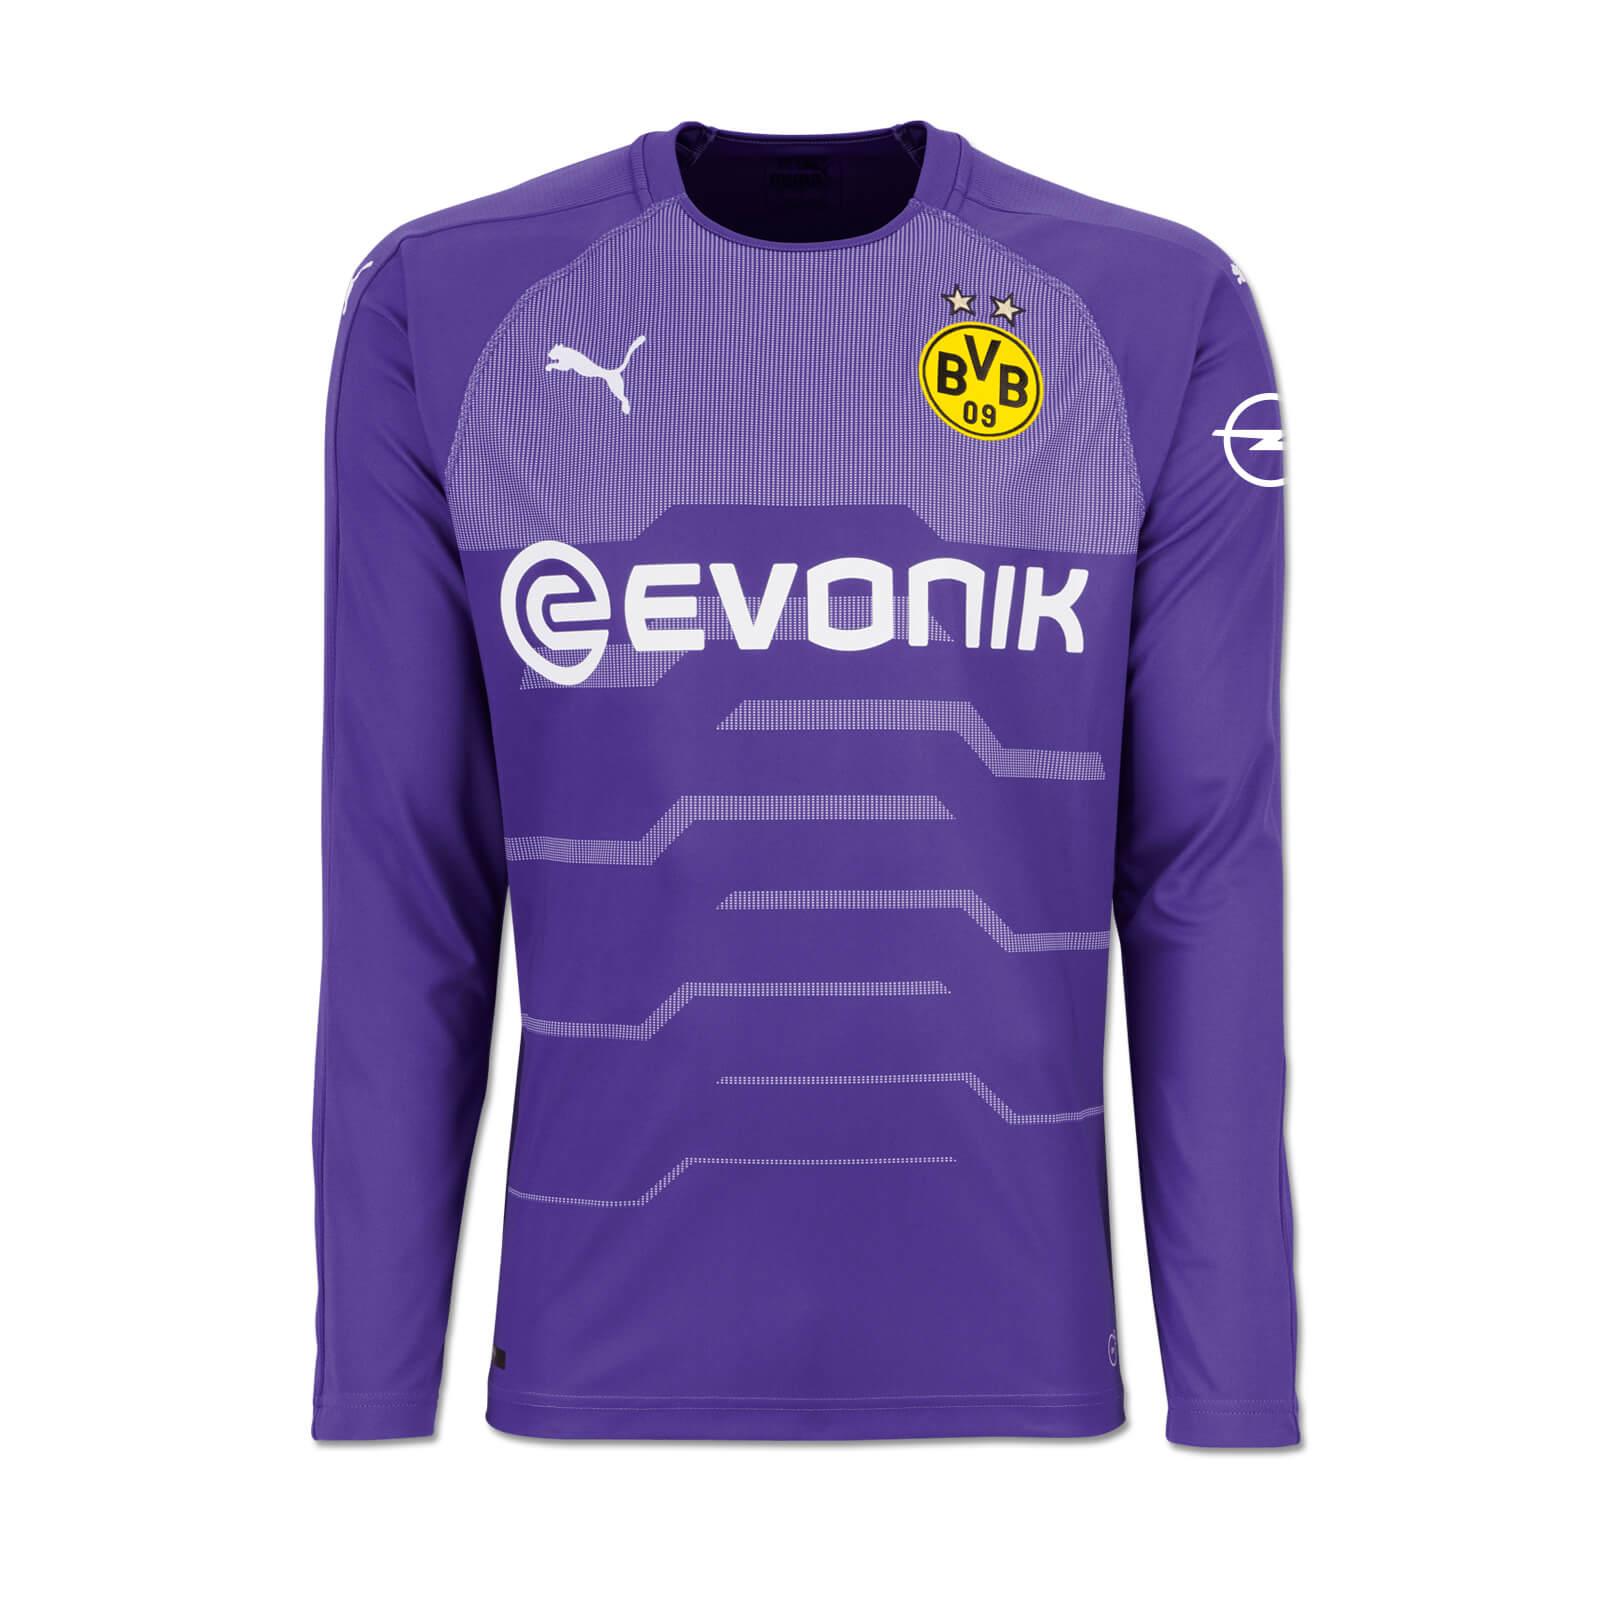 the latest 0705d e2cc5 Borussia Dortmund Goalkeeper Jersey 2018-19 - violet